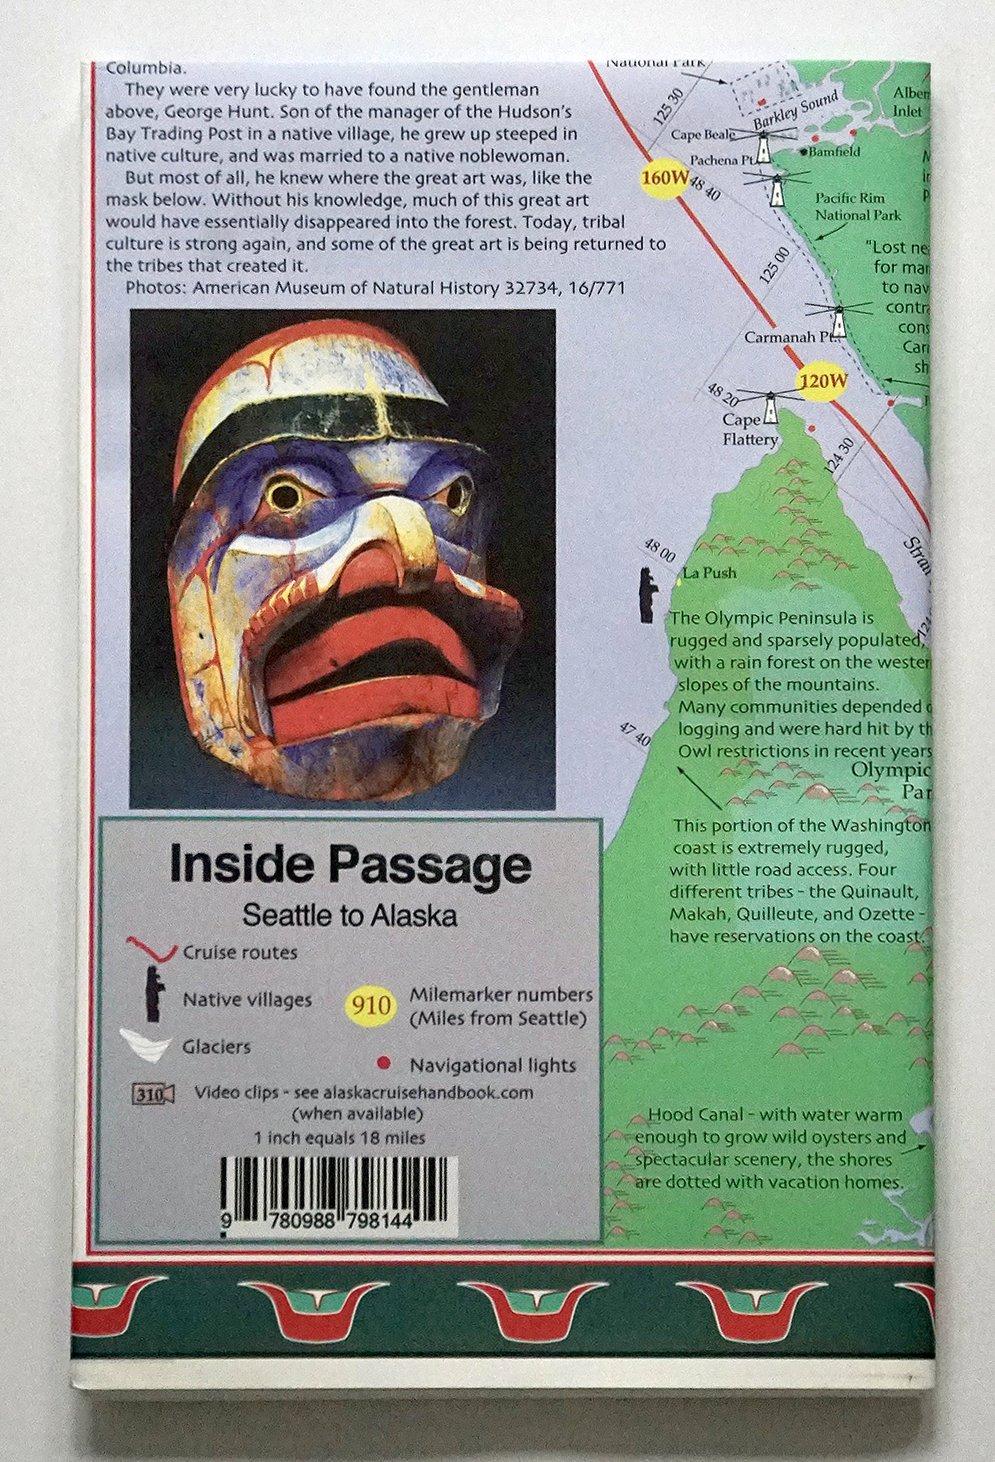 Alaska Cruise Map Illustrated Joe Upton 9780988798144 Amazon Com